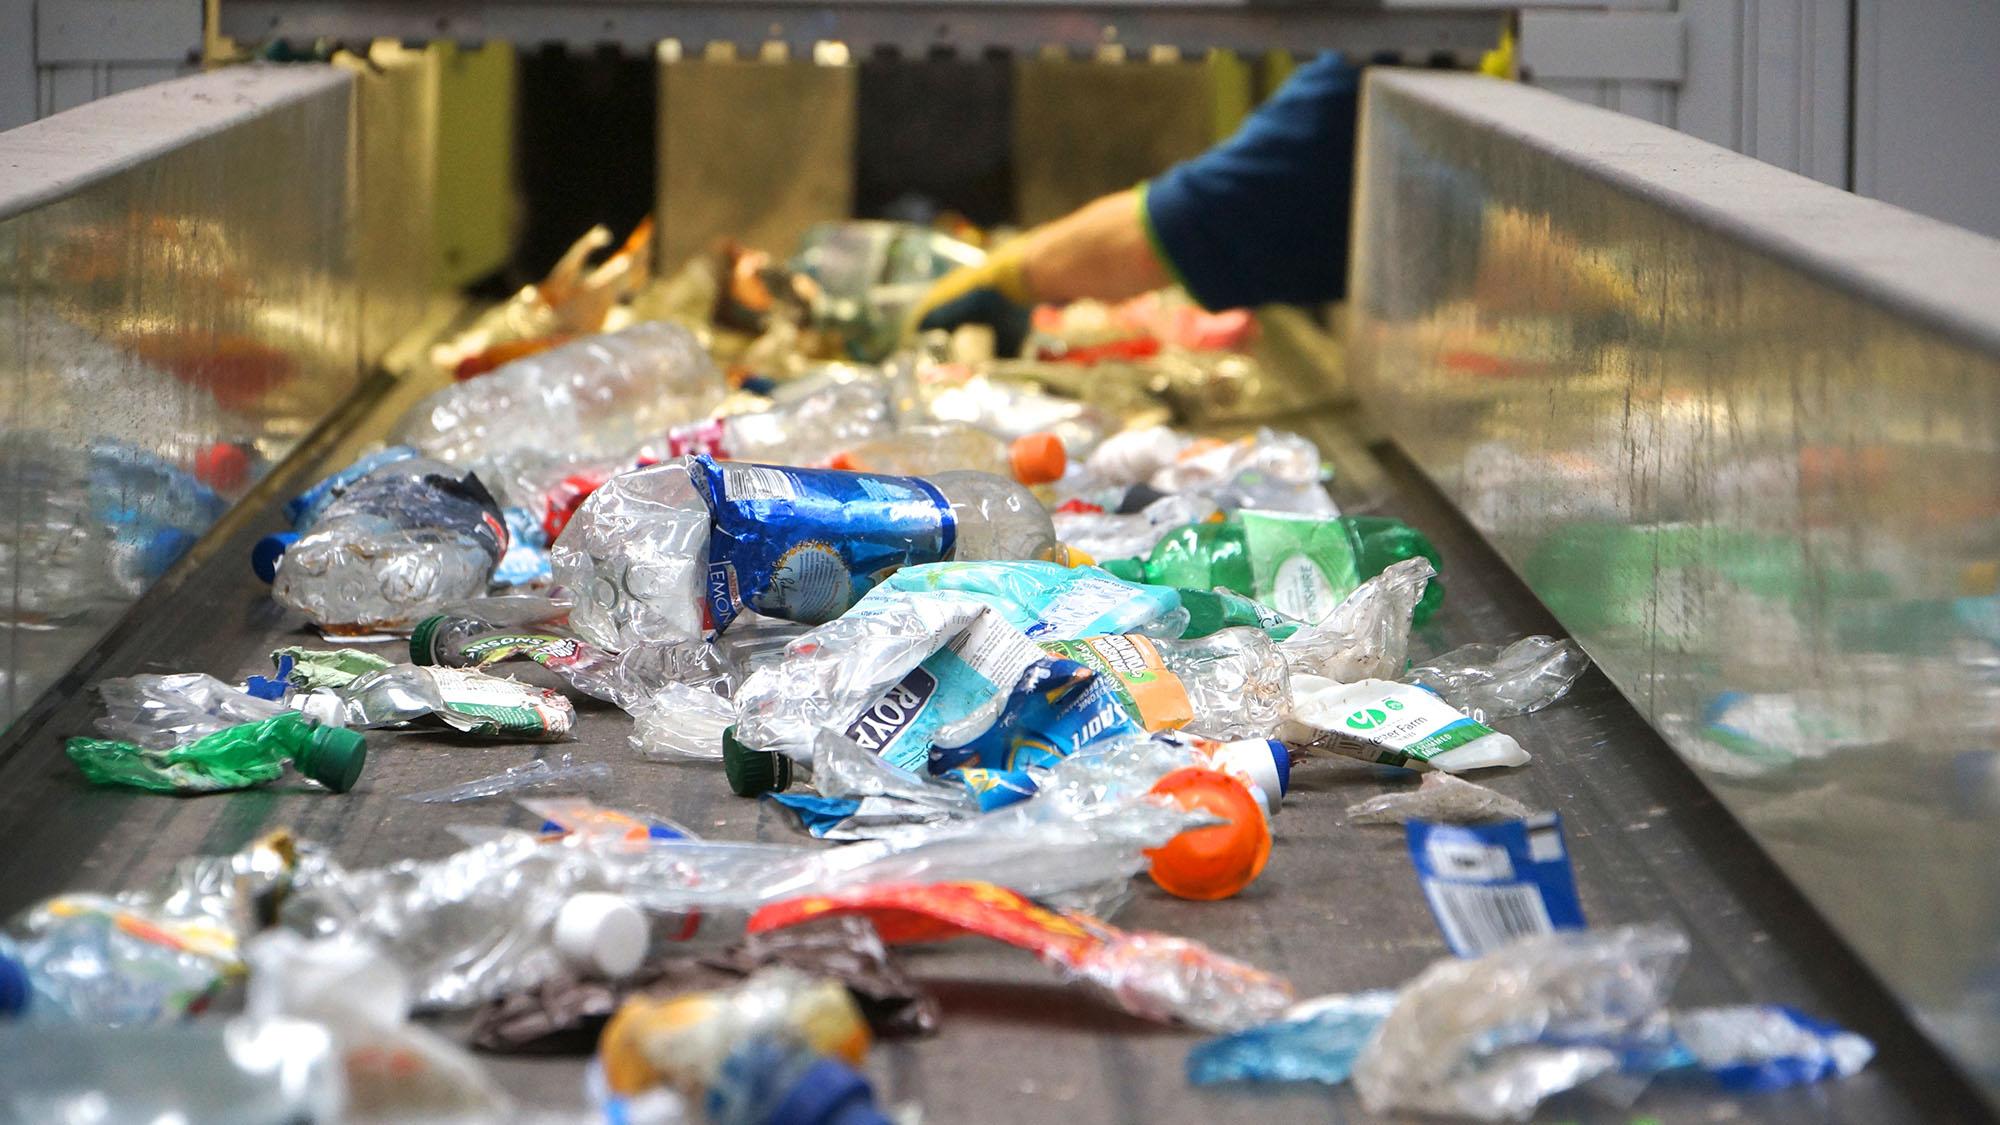 West Sleekburn materials recycling facility conveyor